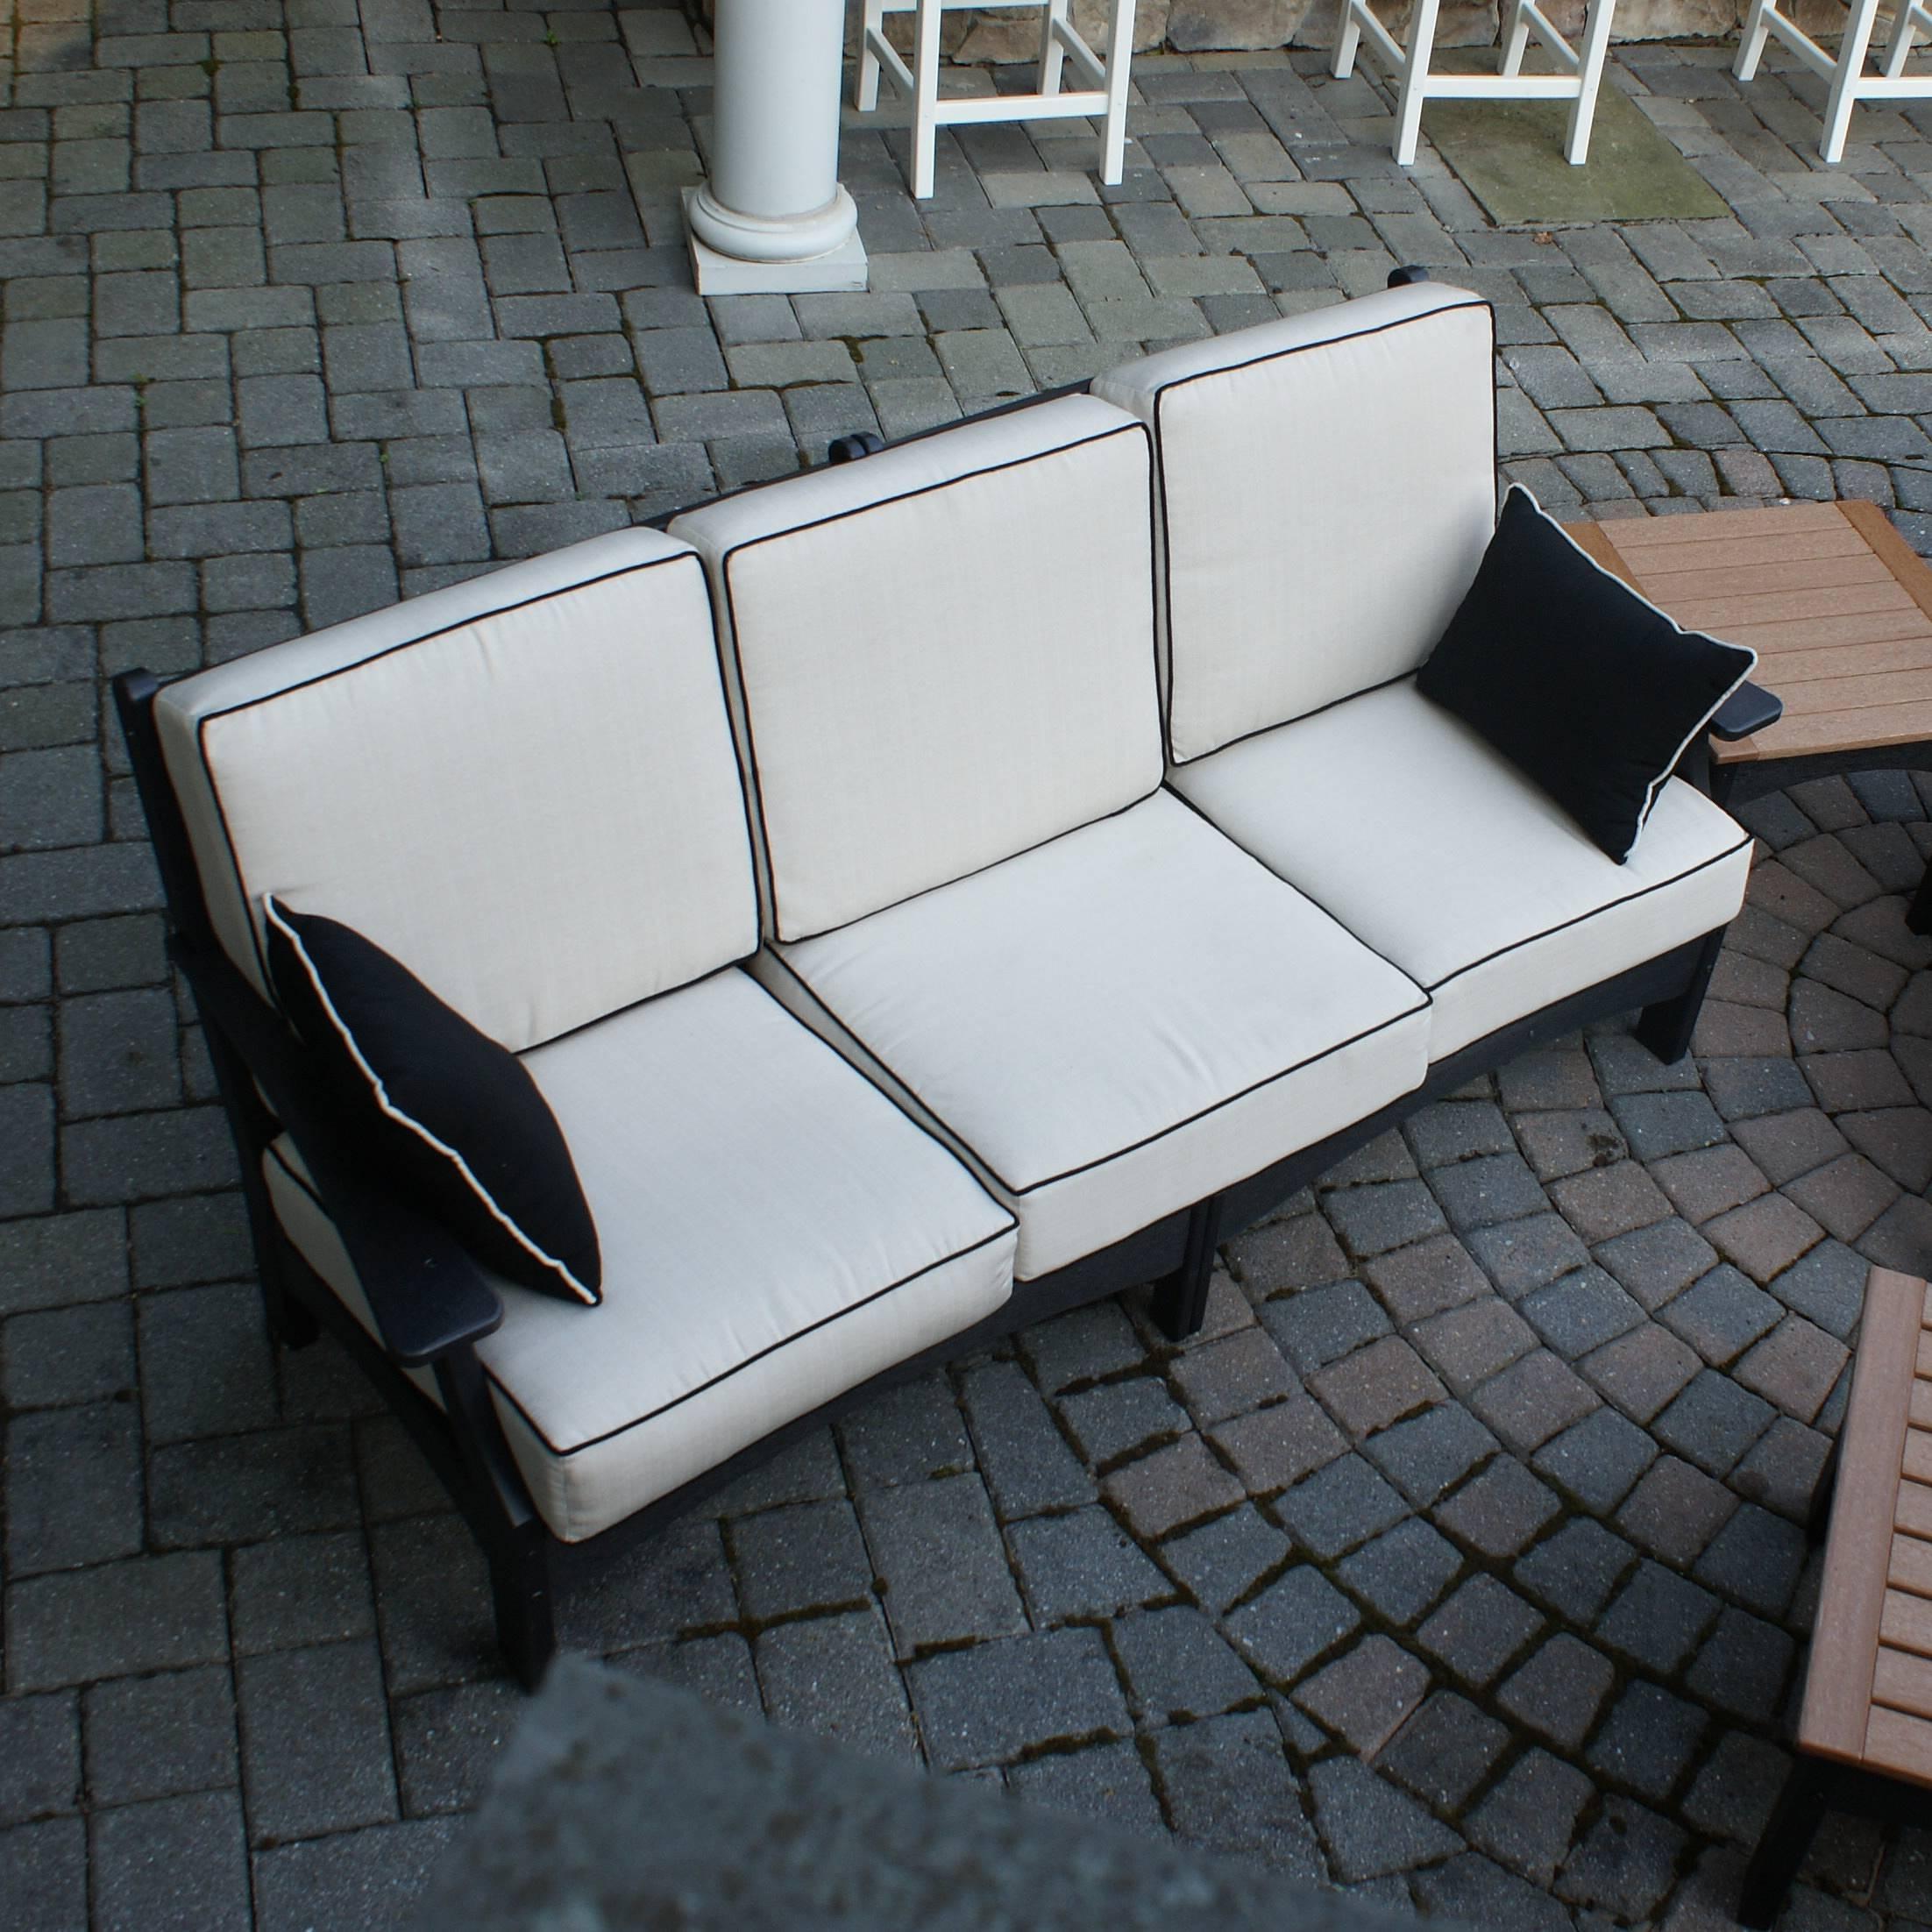 Breezesta™ Piedmont Sofa - Piedmont Deep Seating - Breezesta with regard to Piedmont Sofas (Image 3 of 15)